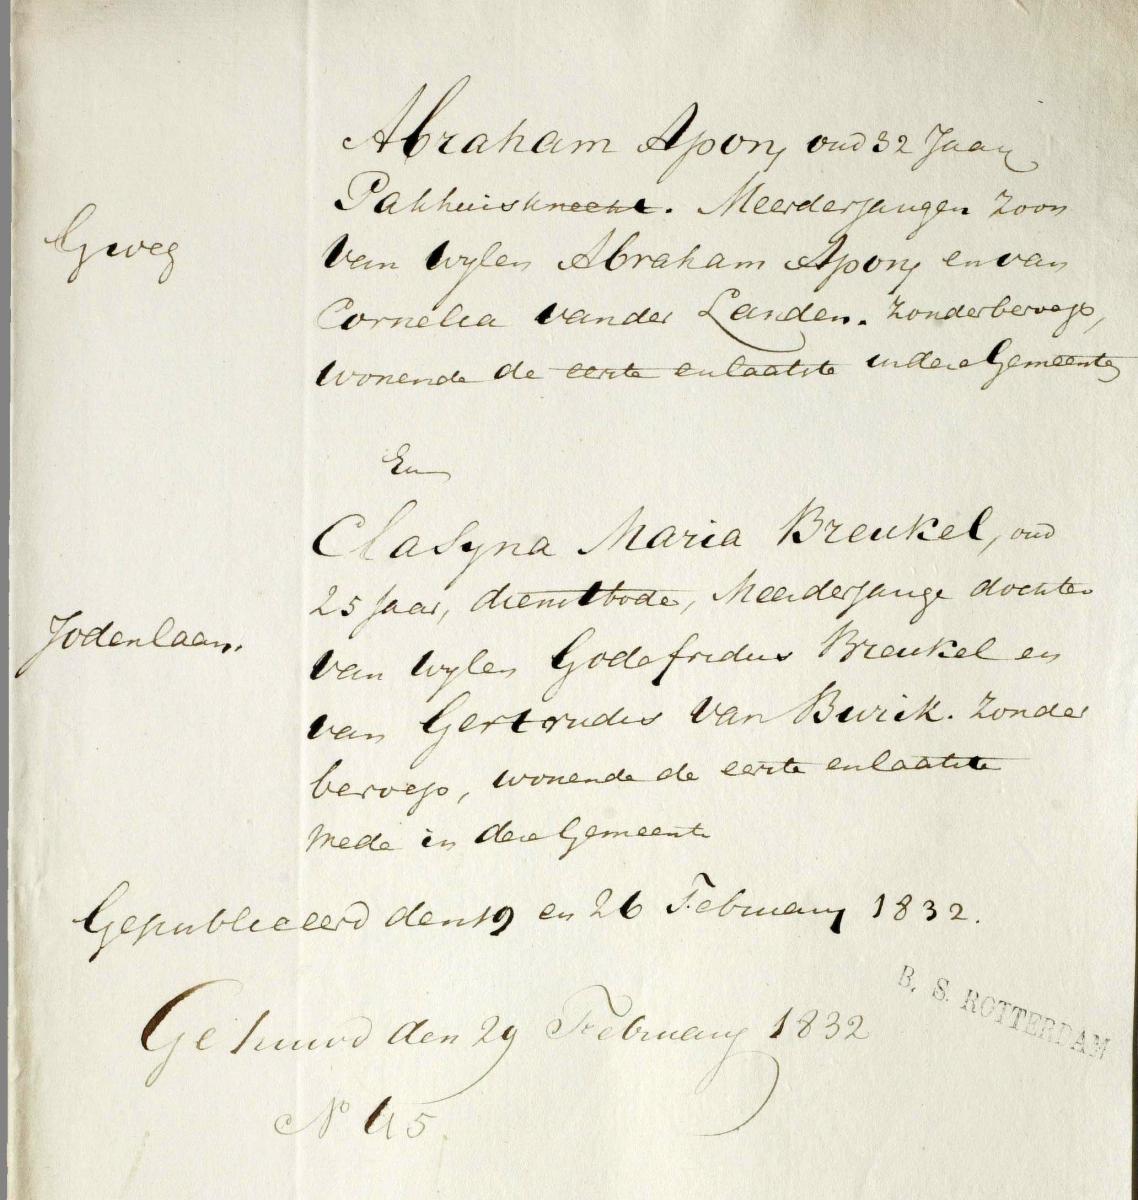 Apon-Abraham-en-Breukel-Clasijna-Maria-Huwelijk-29-02-1832-Rotterdam